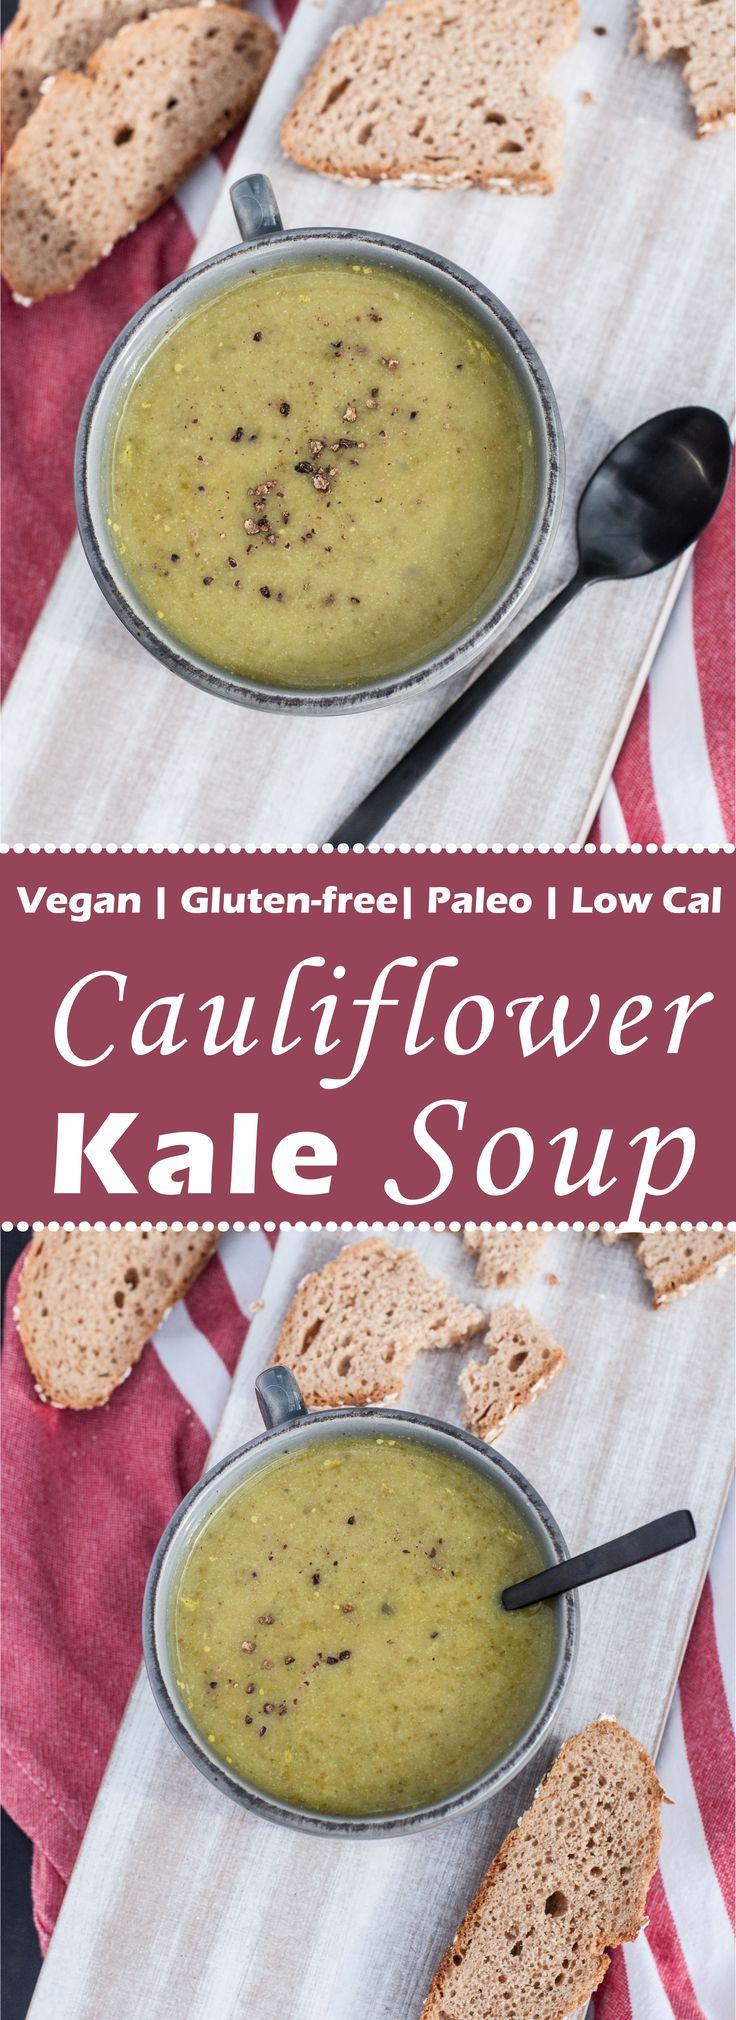 Cauliflower Kale soup